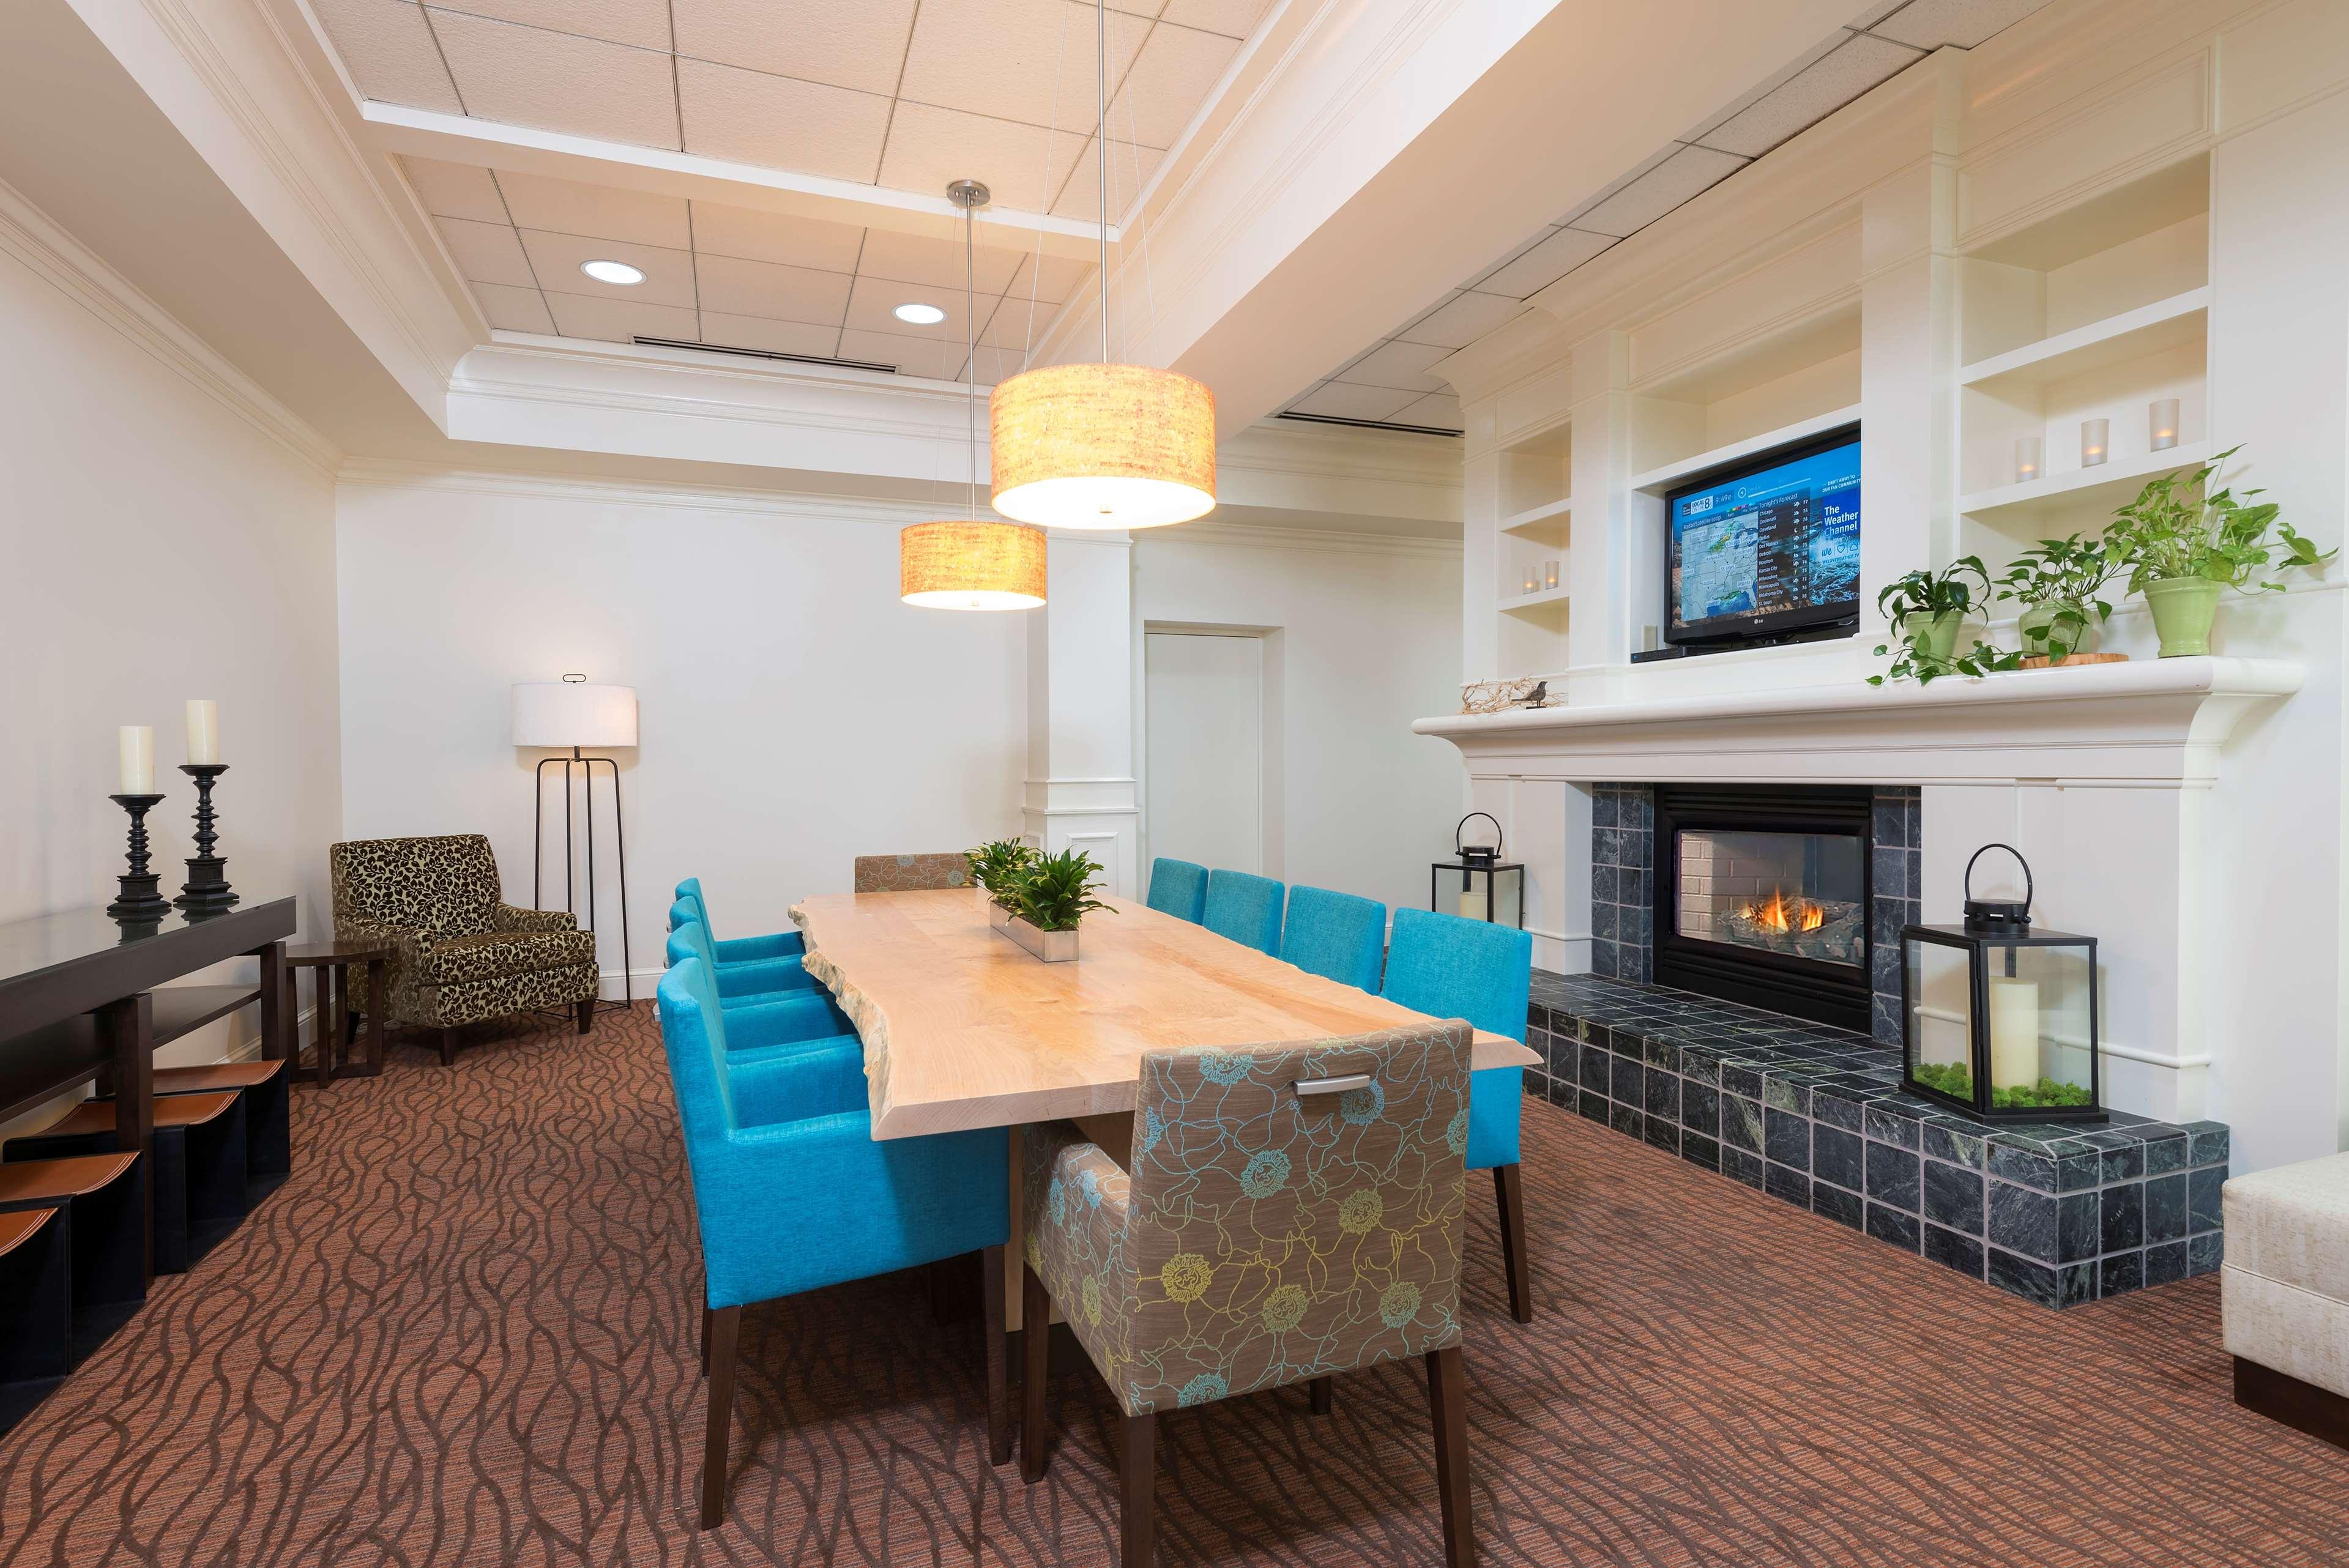 Hilton Garden Inn West Lafayette Wabash Landing image 6